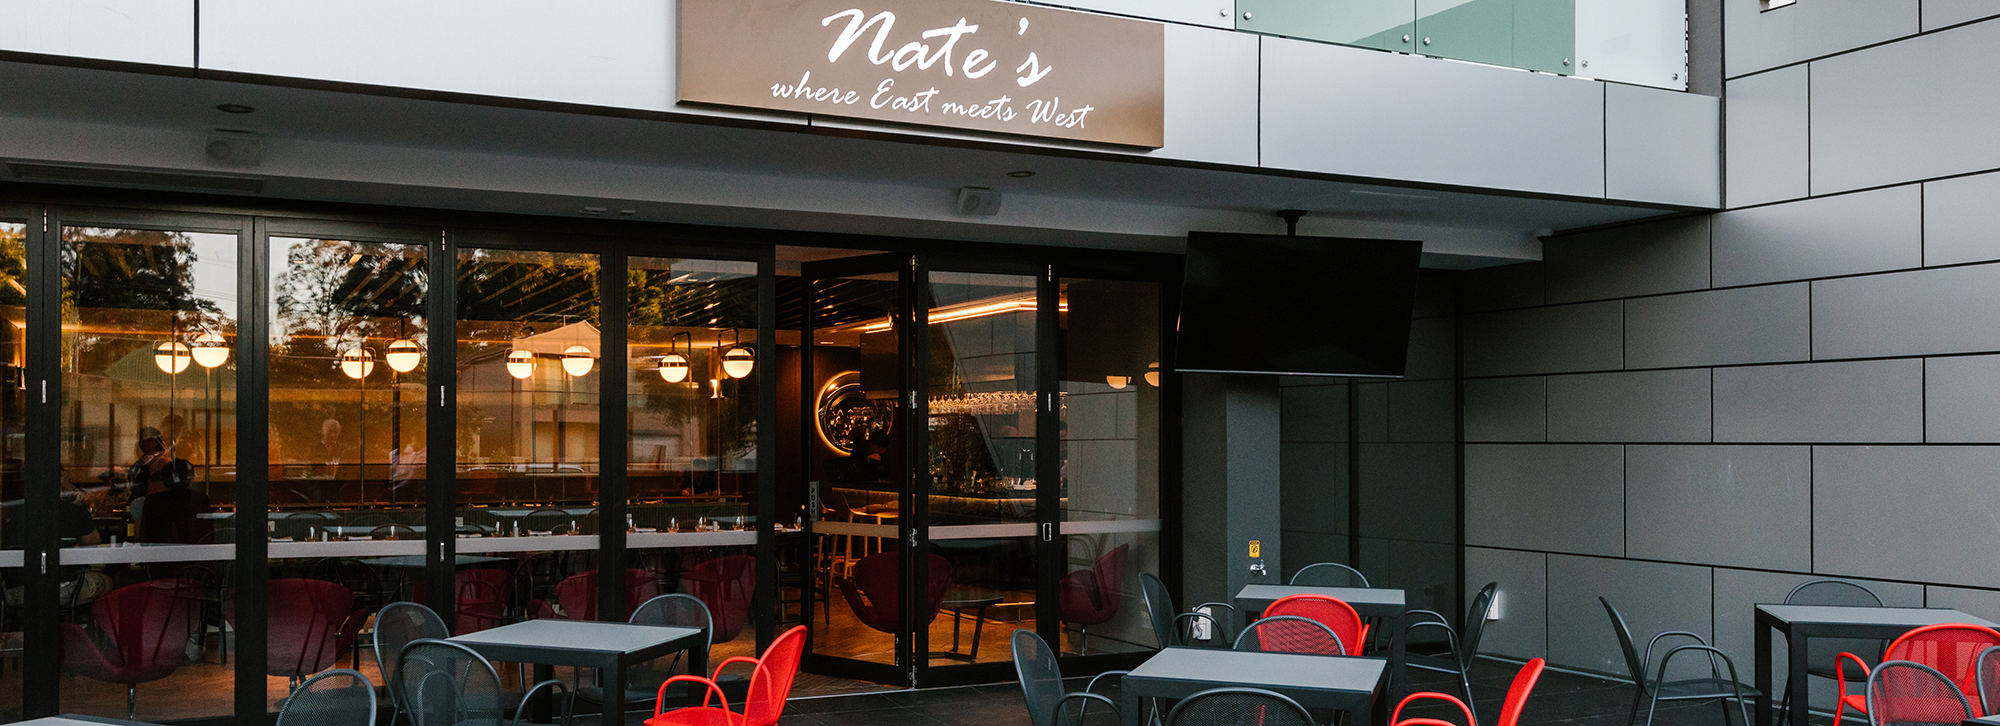 Nate's-Alfresco-Area